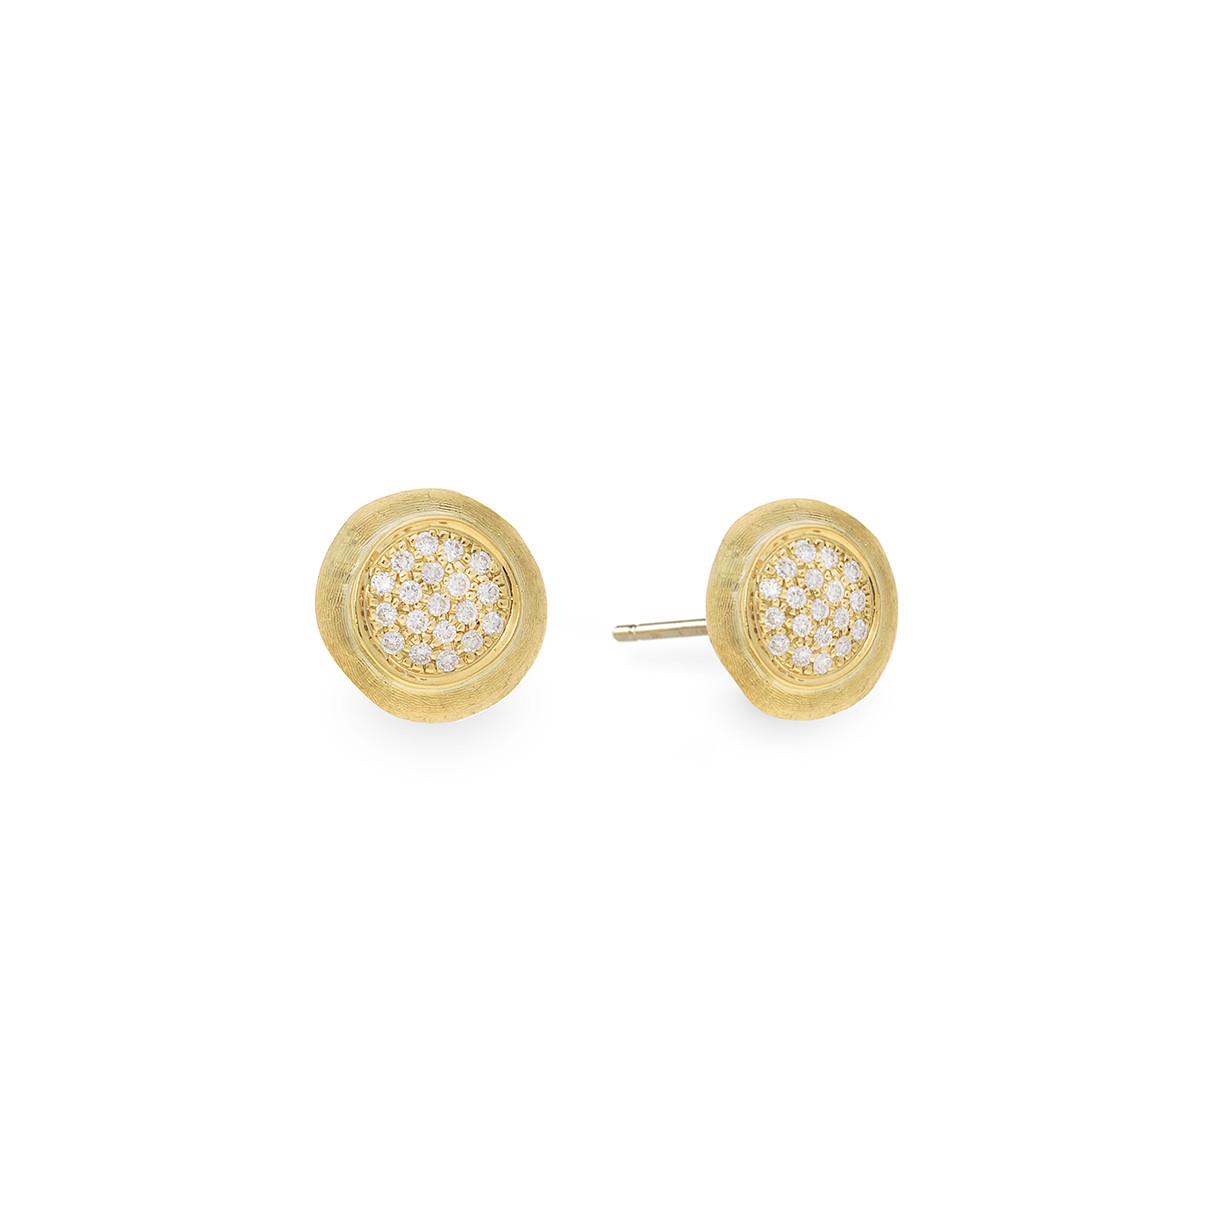 Marco Bicego Yellow Gold Circle Diamond Stud Jaipur Earrings